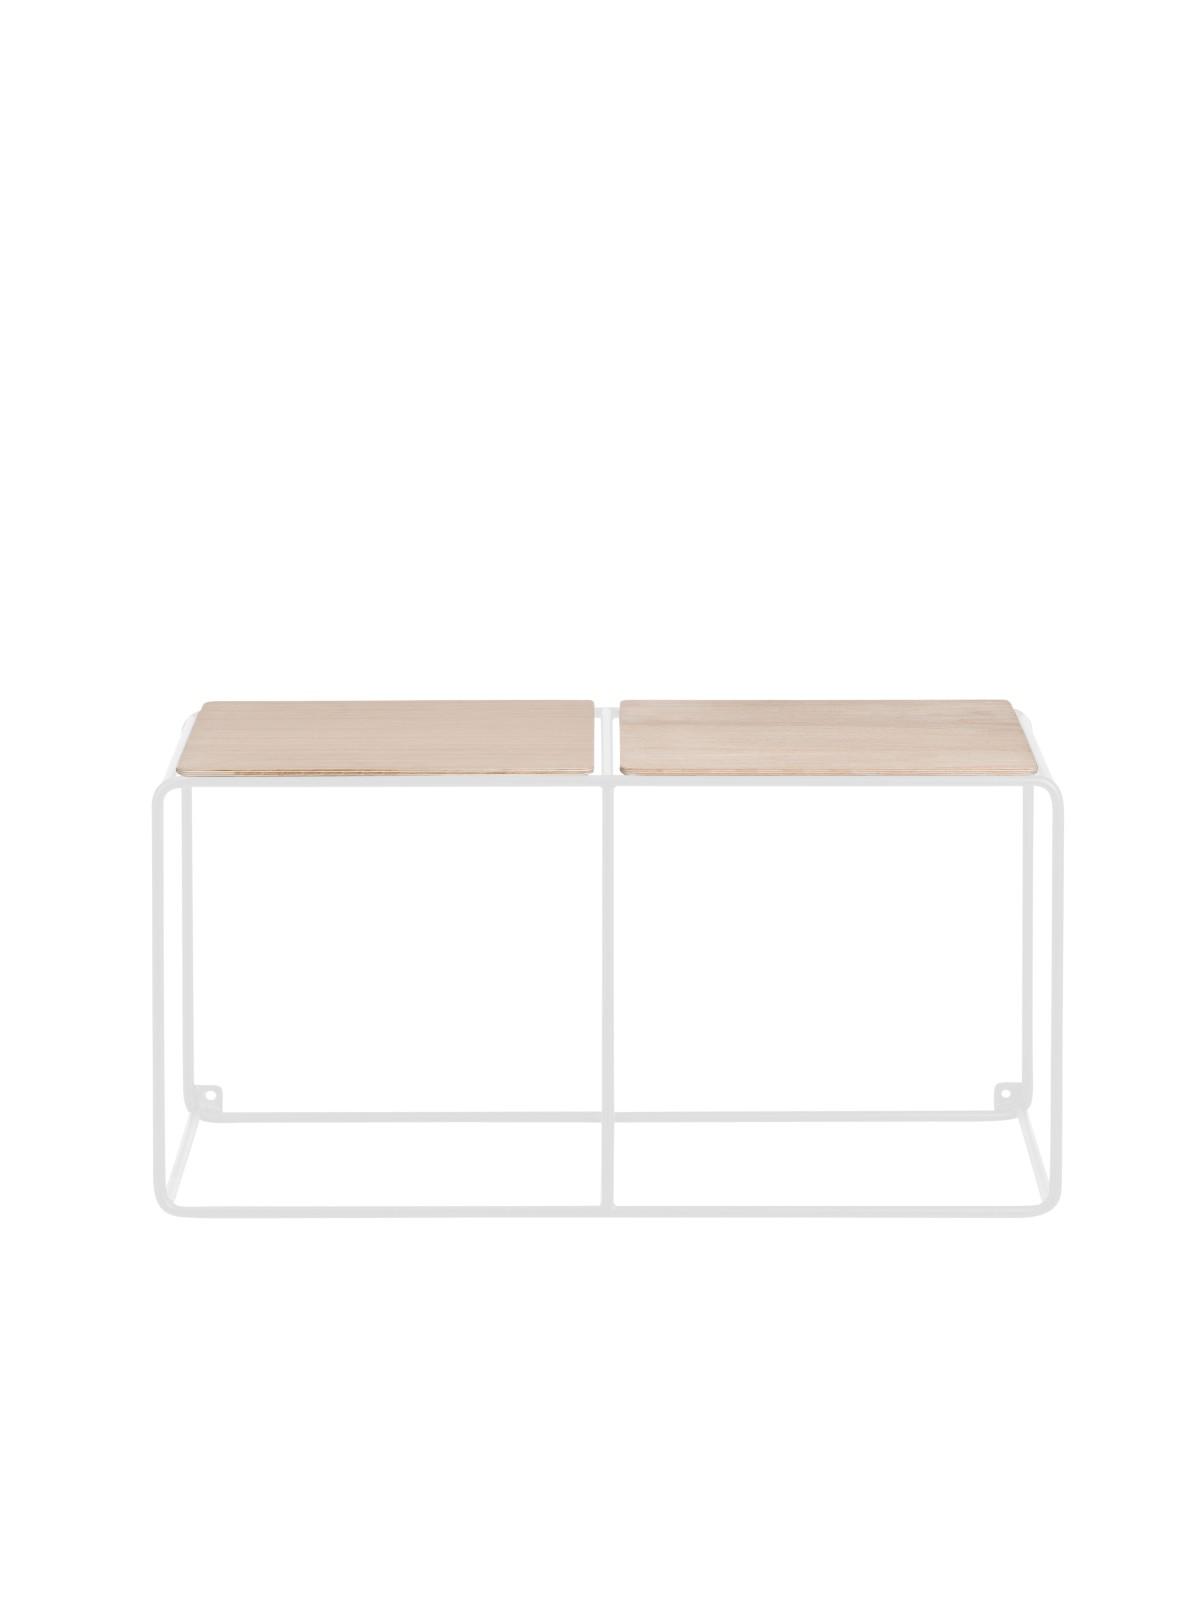 Anywhere System Shelf Anywhere 1 x 2 w. 2 shelves White/Oak